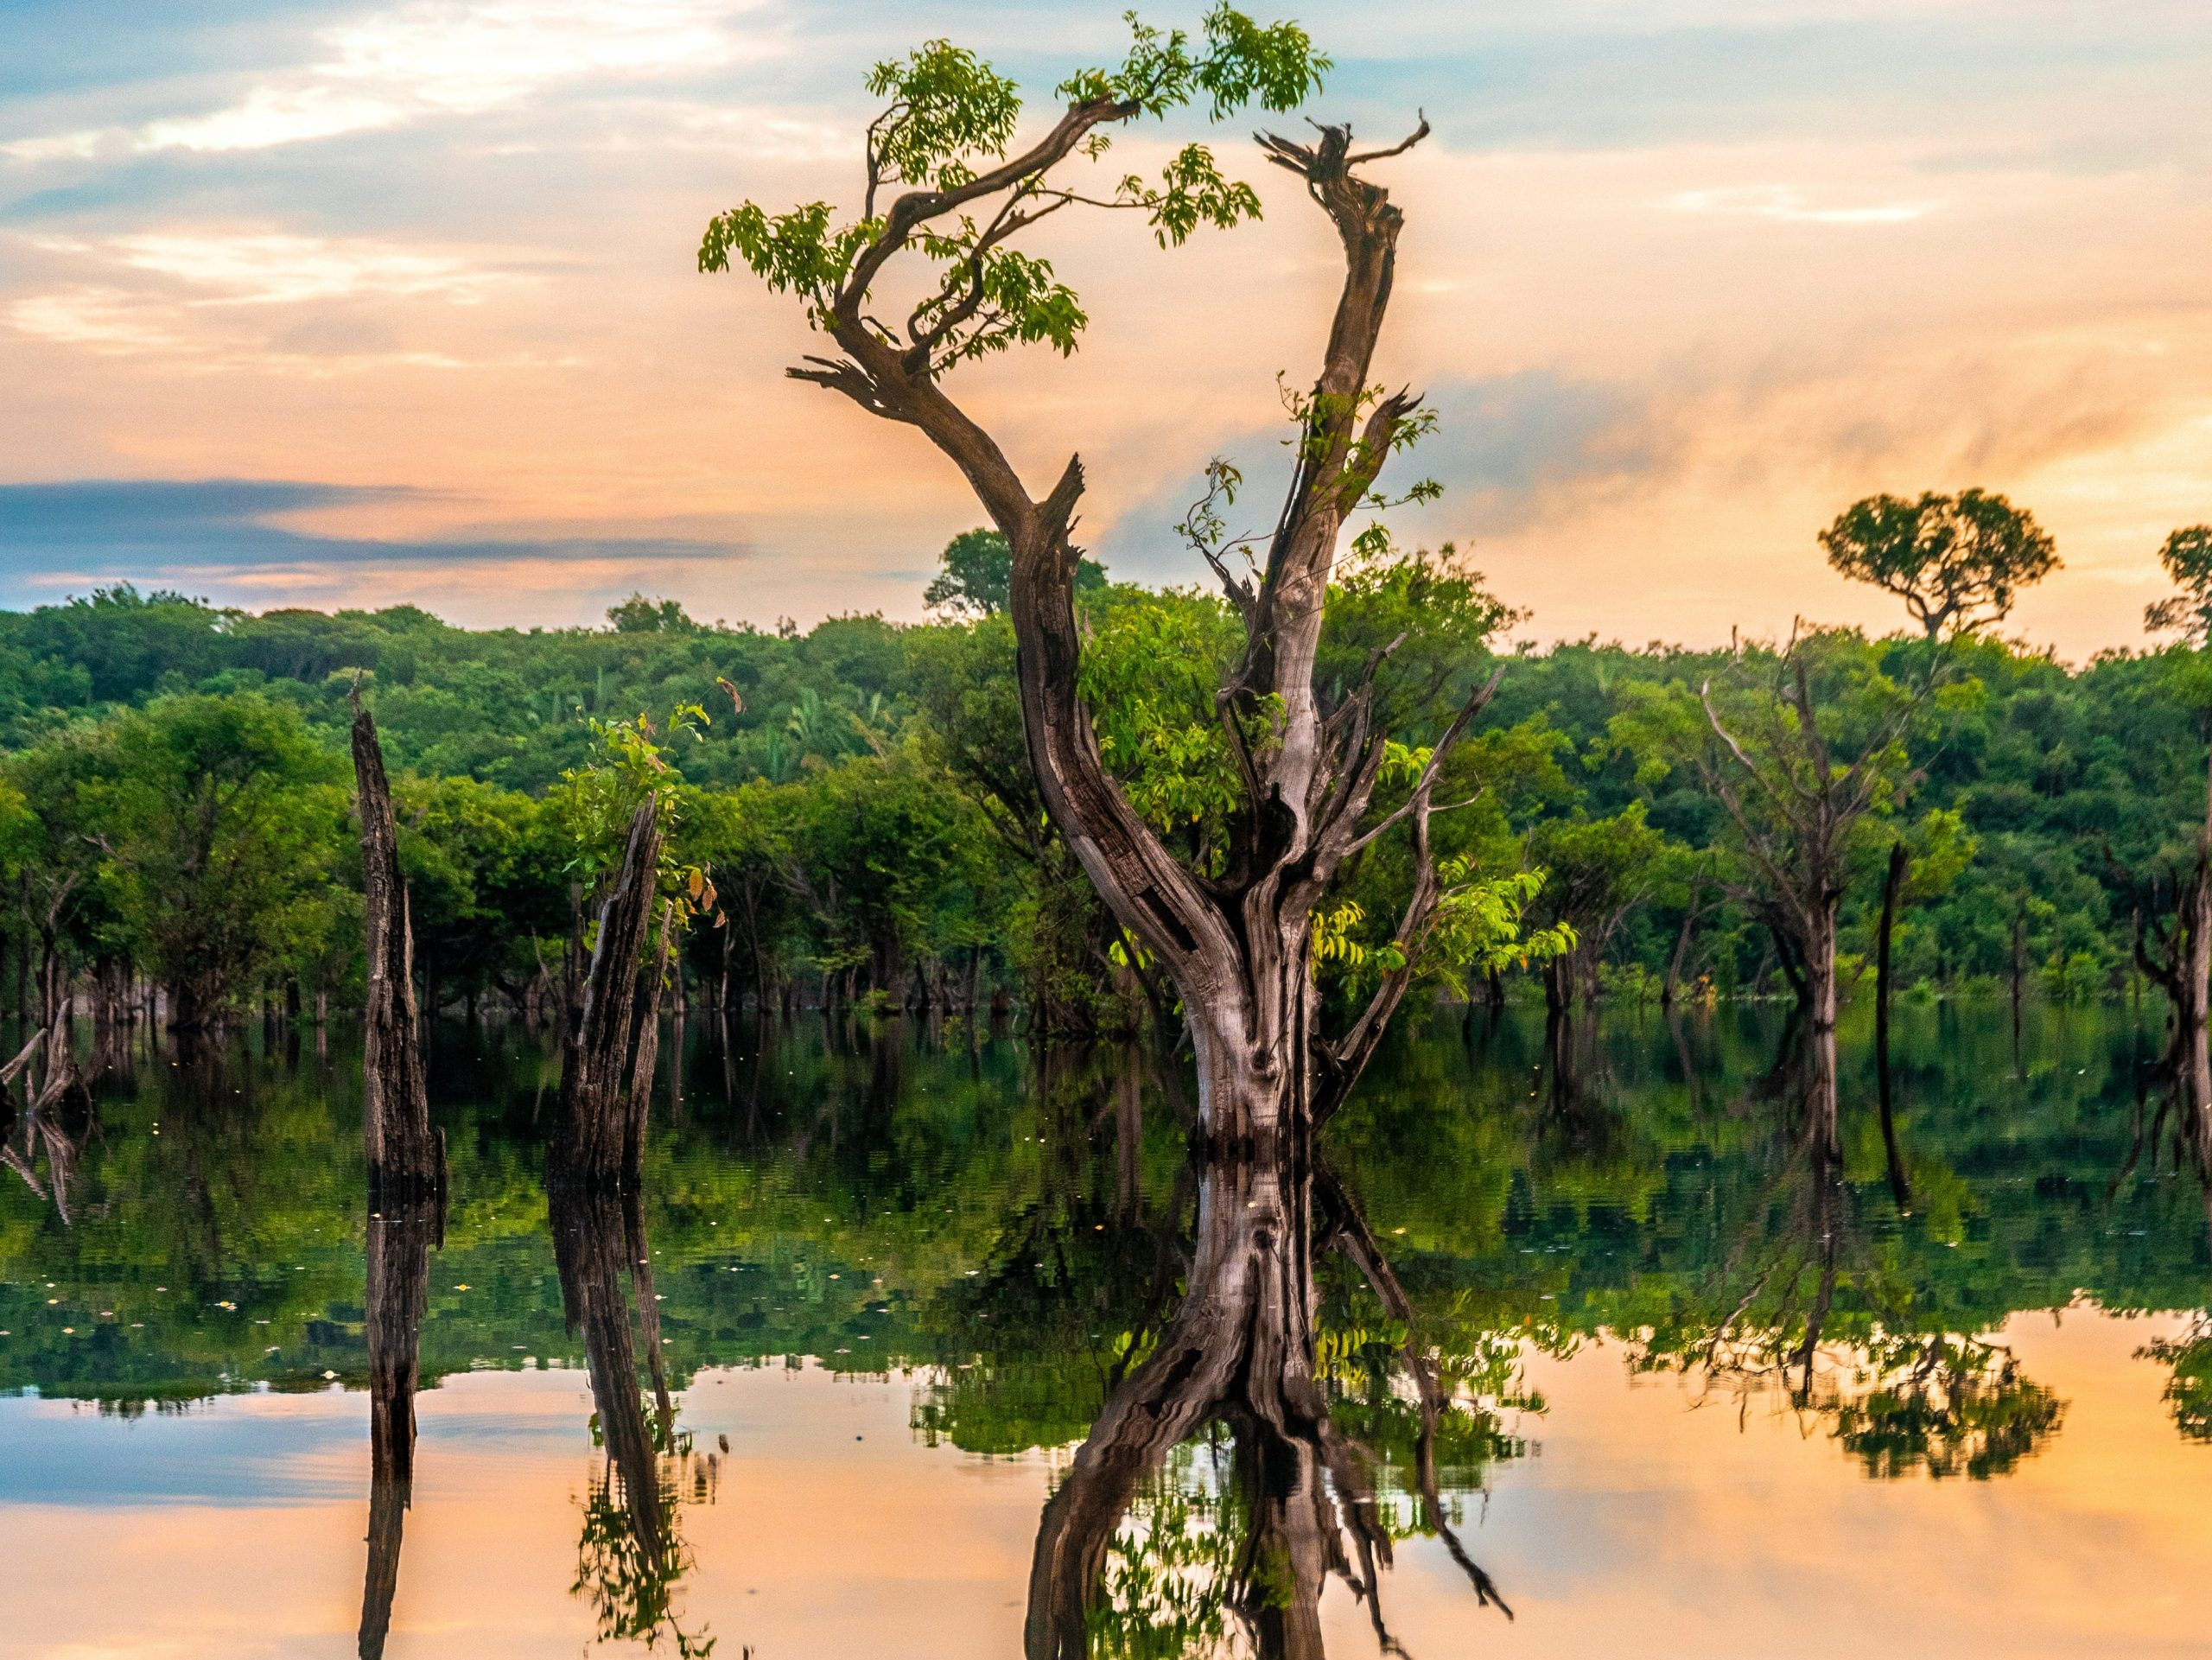 The flooded trees of Amazonas, Brazil (Photo by Sébastien Goldberg)